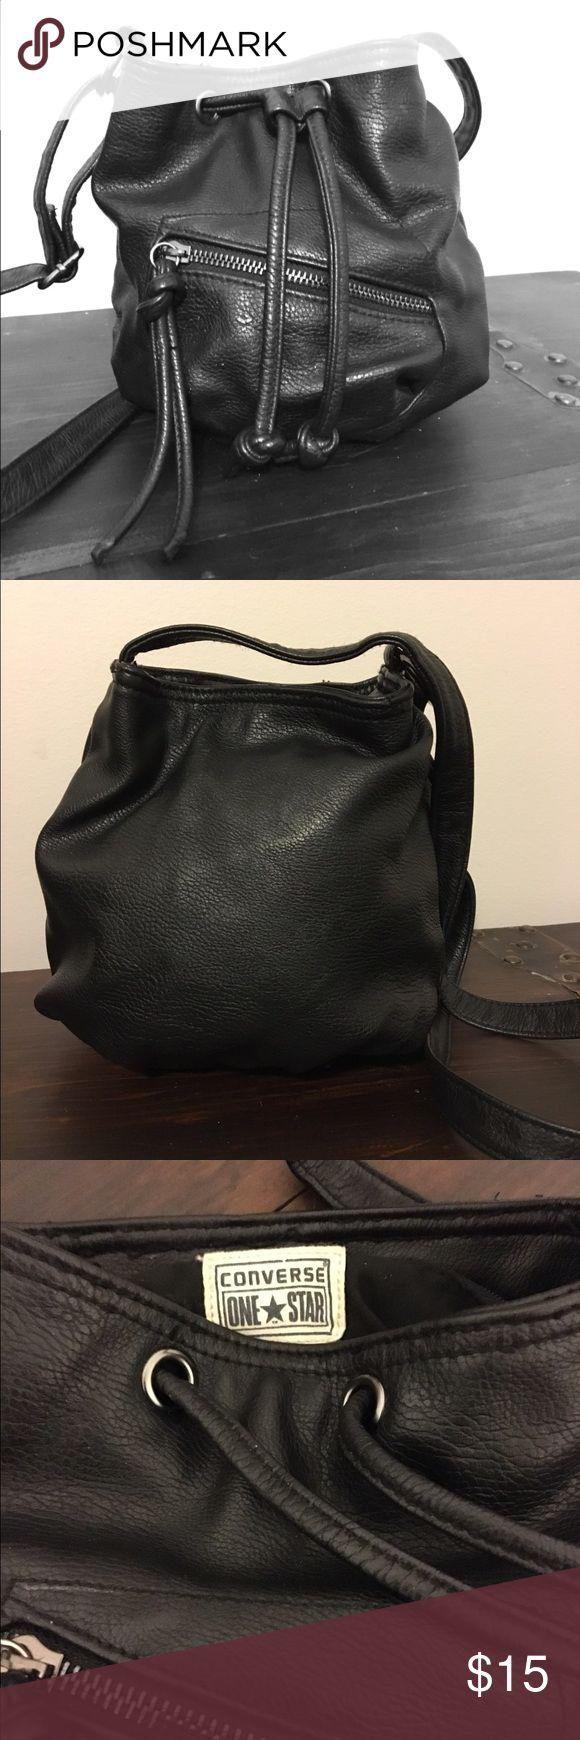 "Converse One Star black crossbody bucket bag Converse One Star black crossbody bucket bag. 9""wide x 7.5"" tall. Converse Bags Mini Bags"